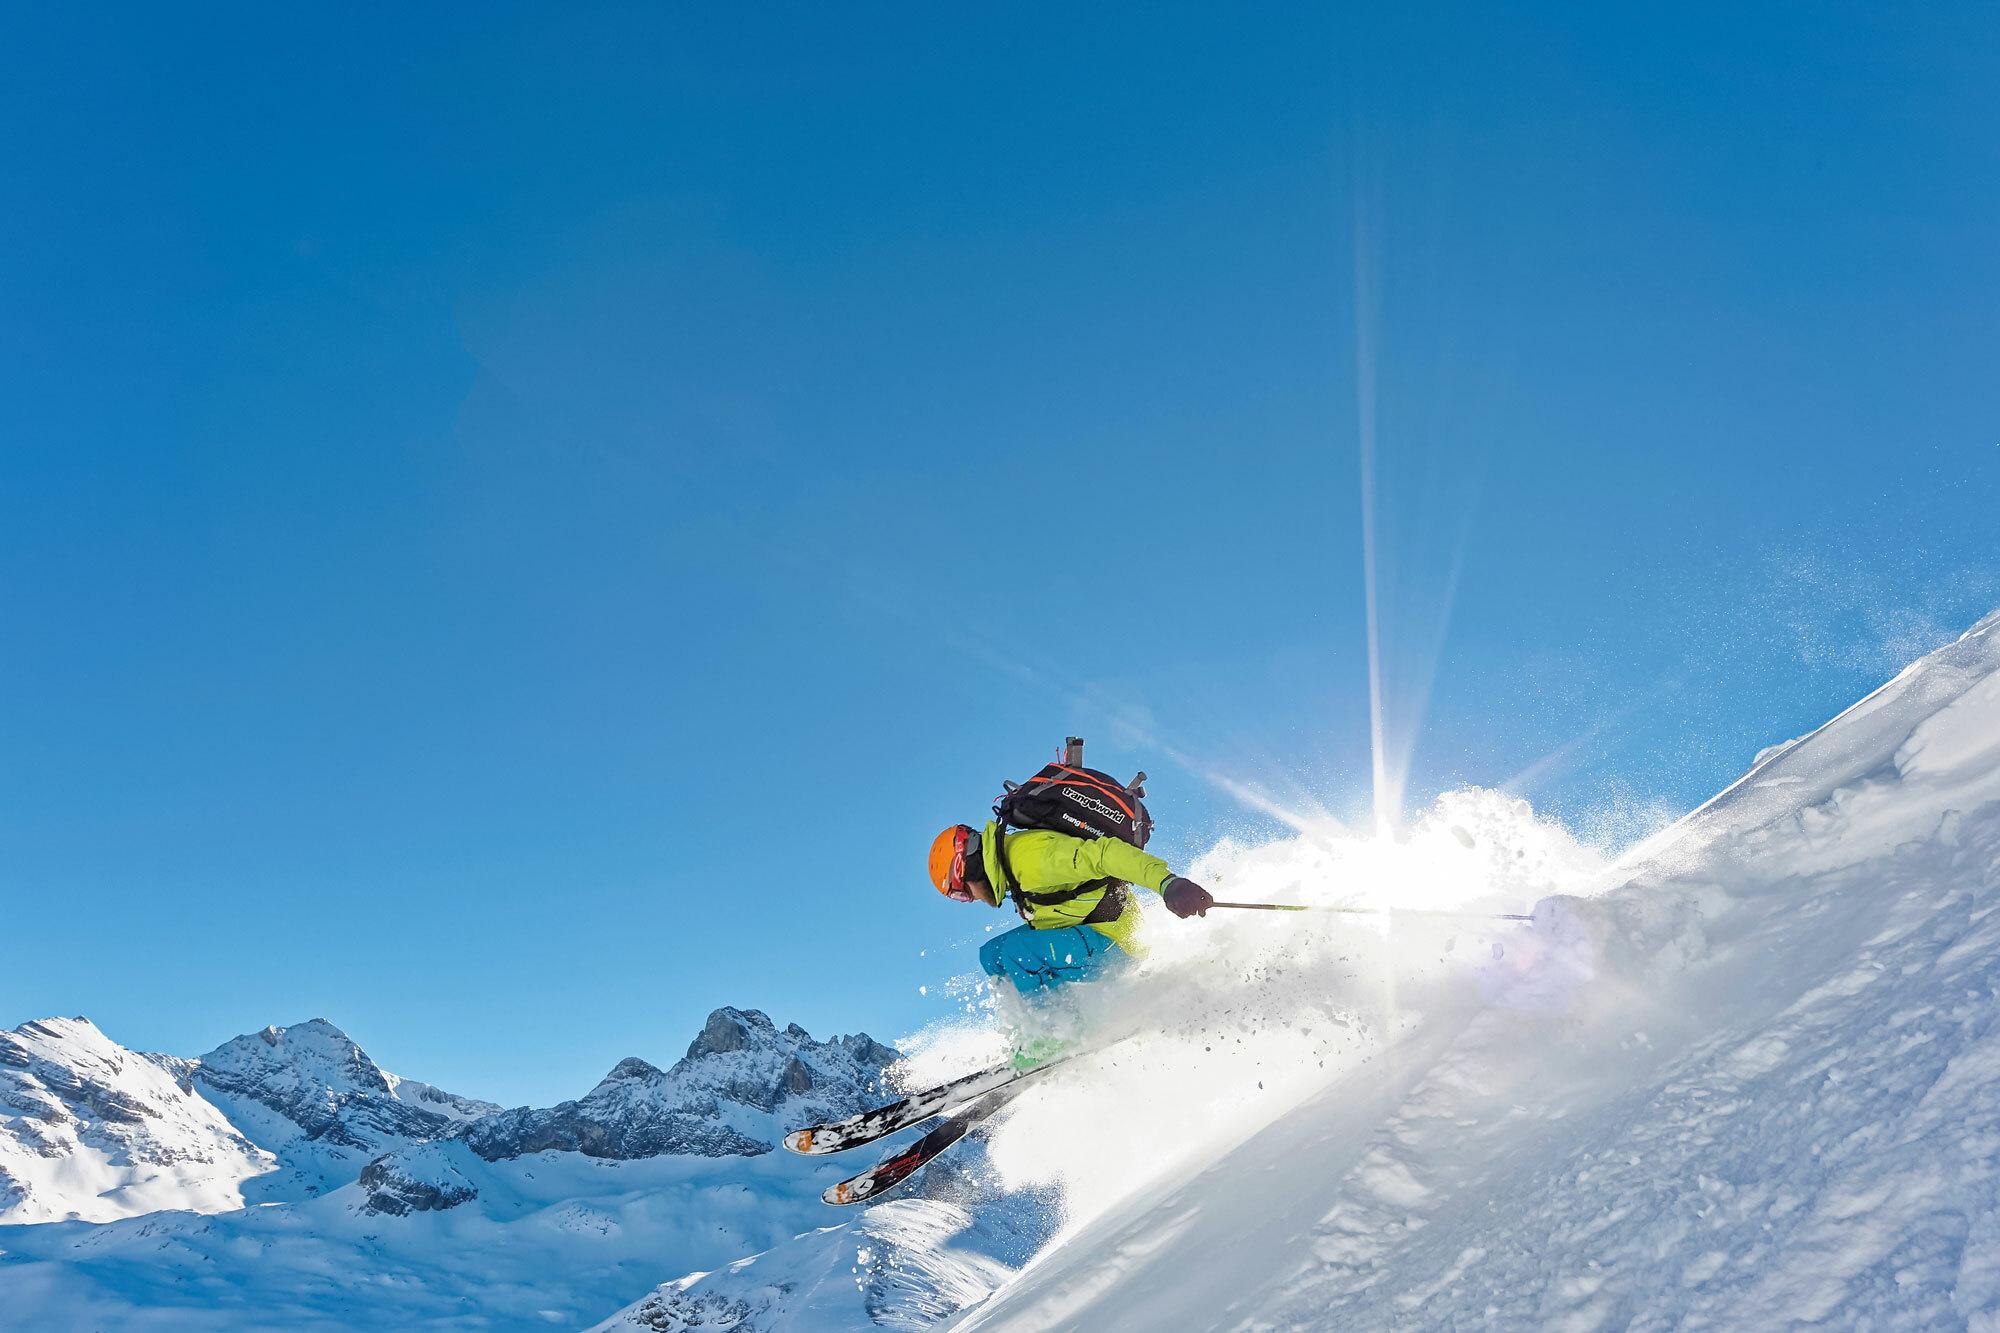 Zeitreise in der Kuhgondel – Skitourensafari in Engelberg